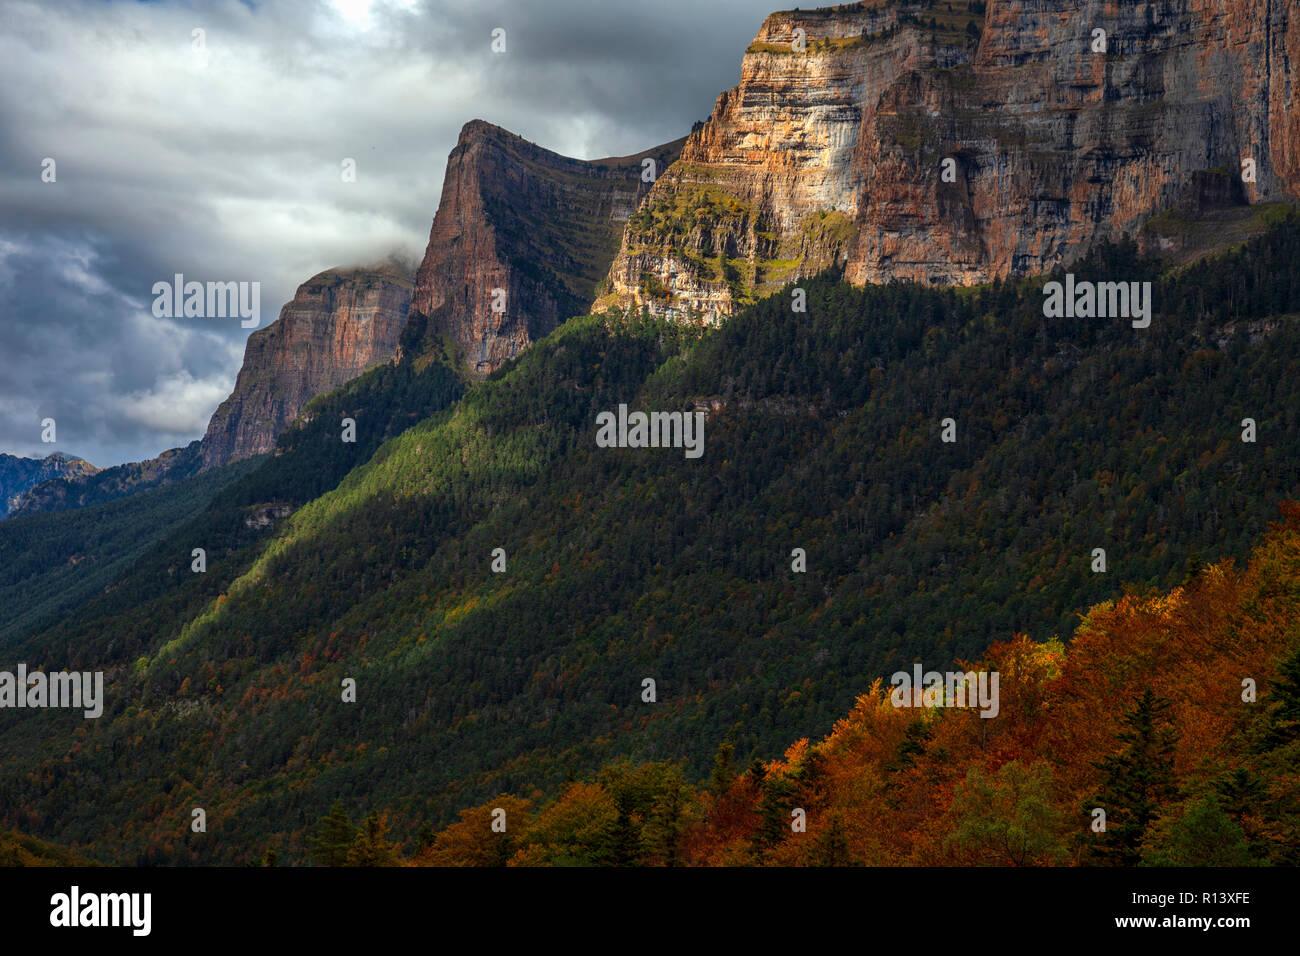 National park of Ordesa and Monte Perdido. Huesca, Spain Stock Photo